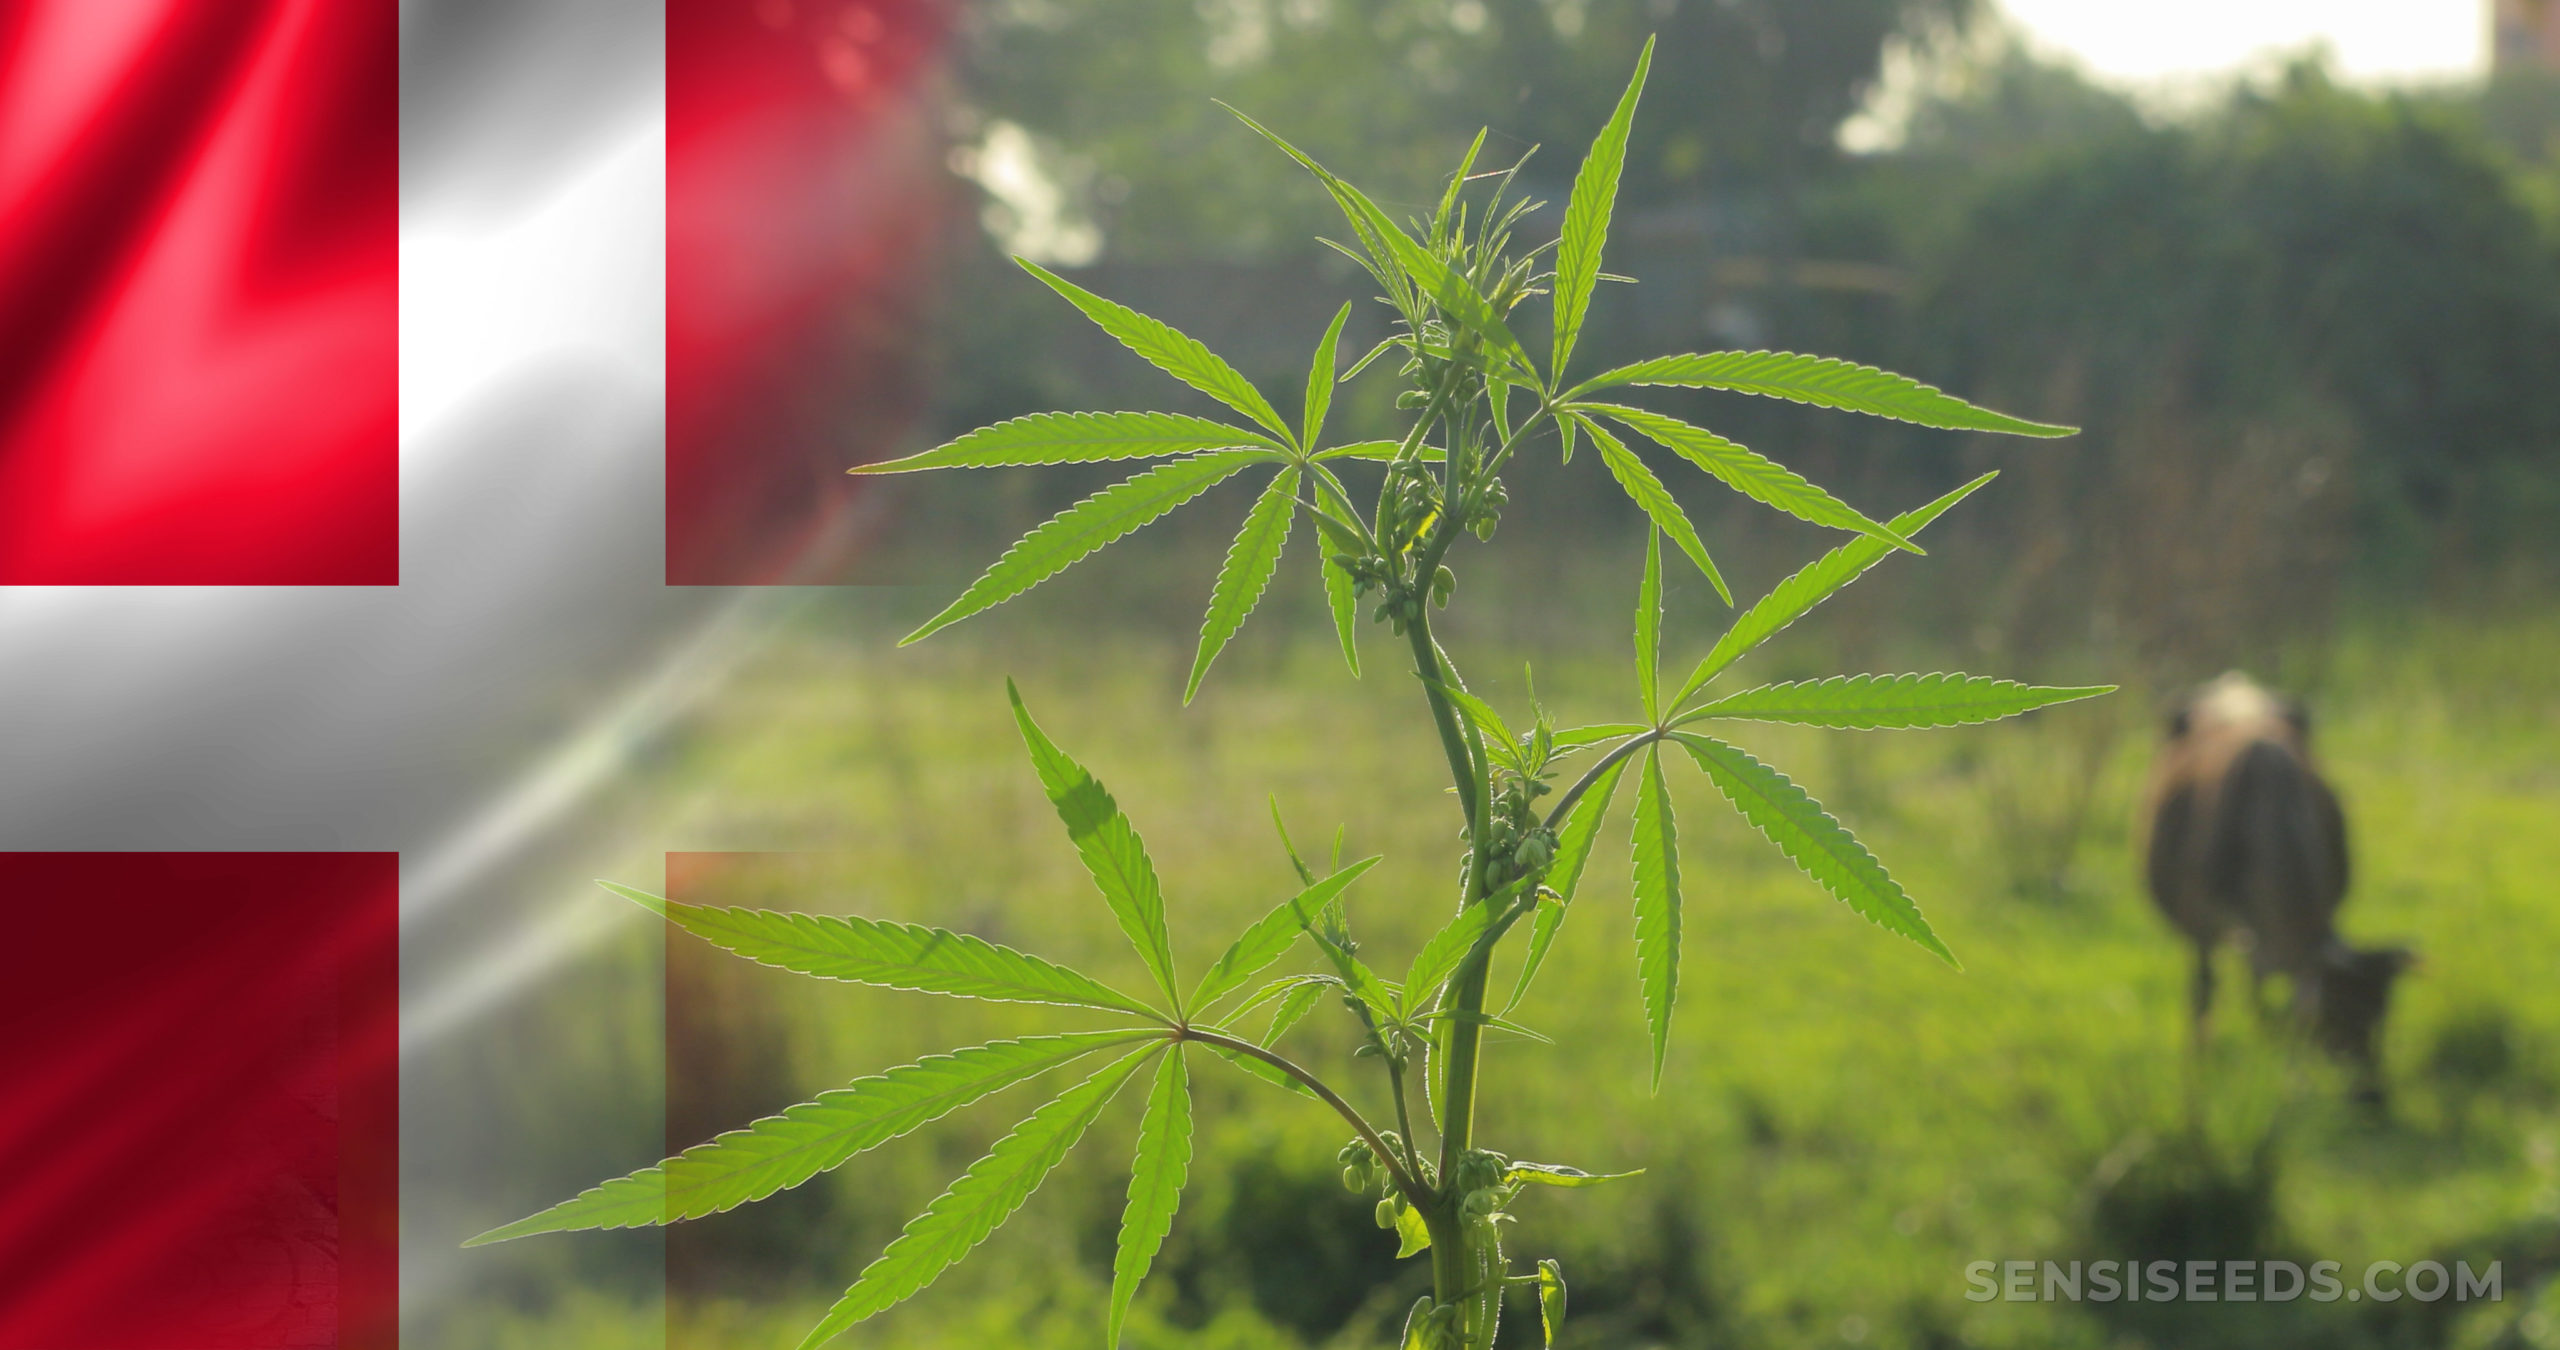 The Danish flag and a cannabis plant